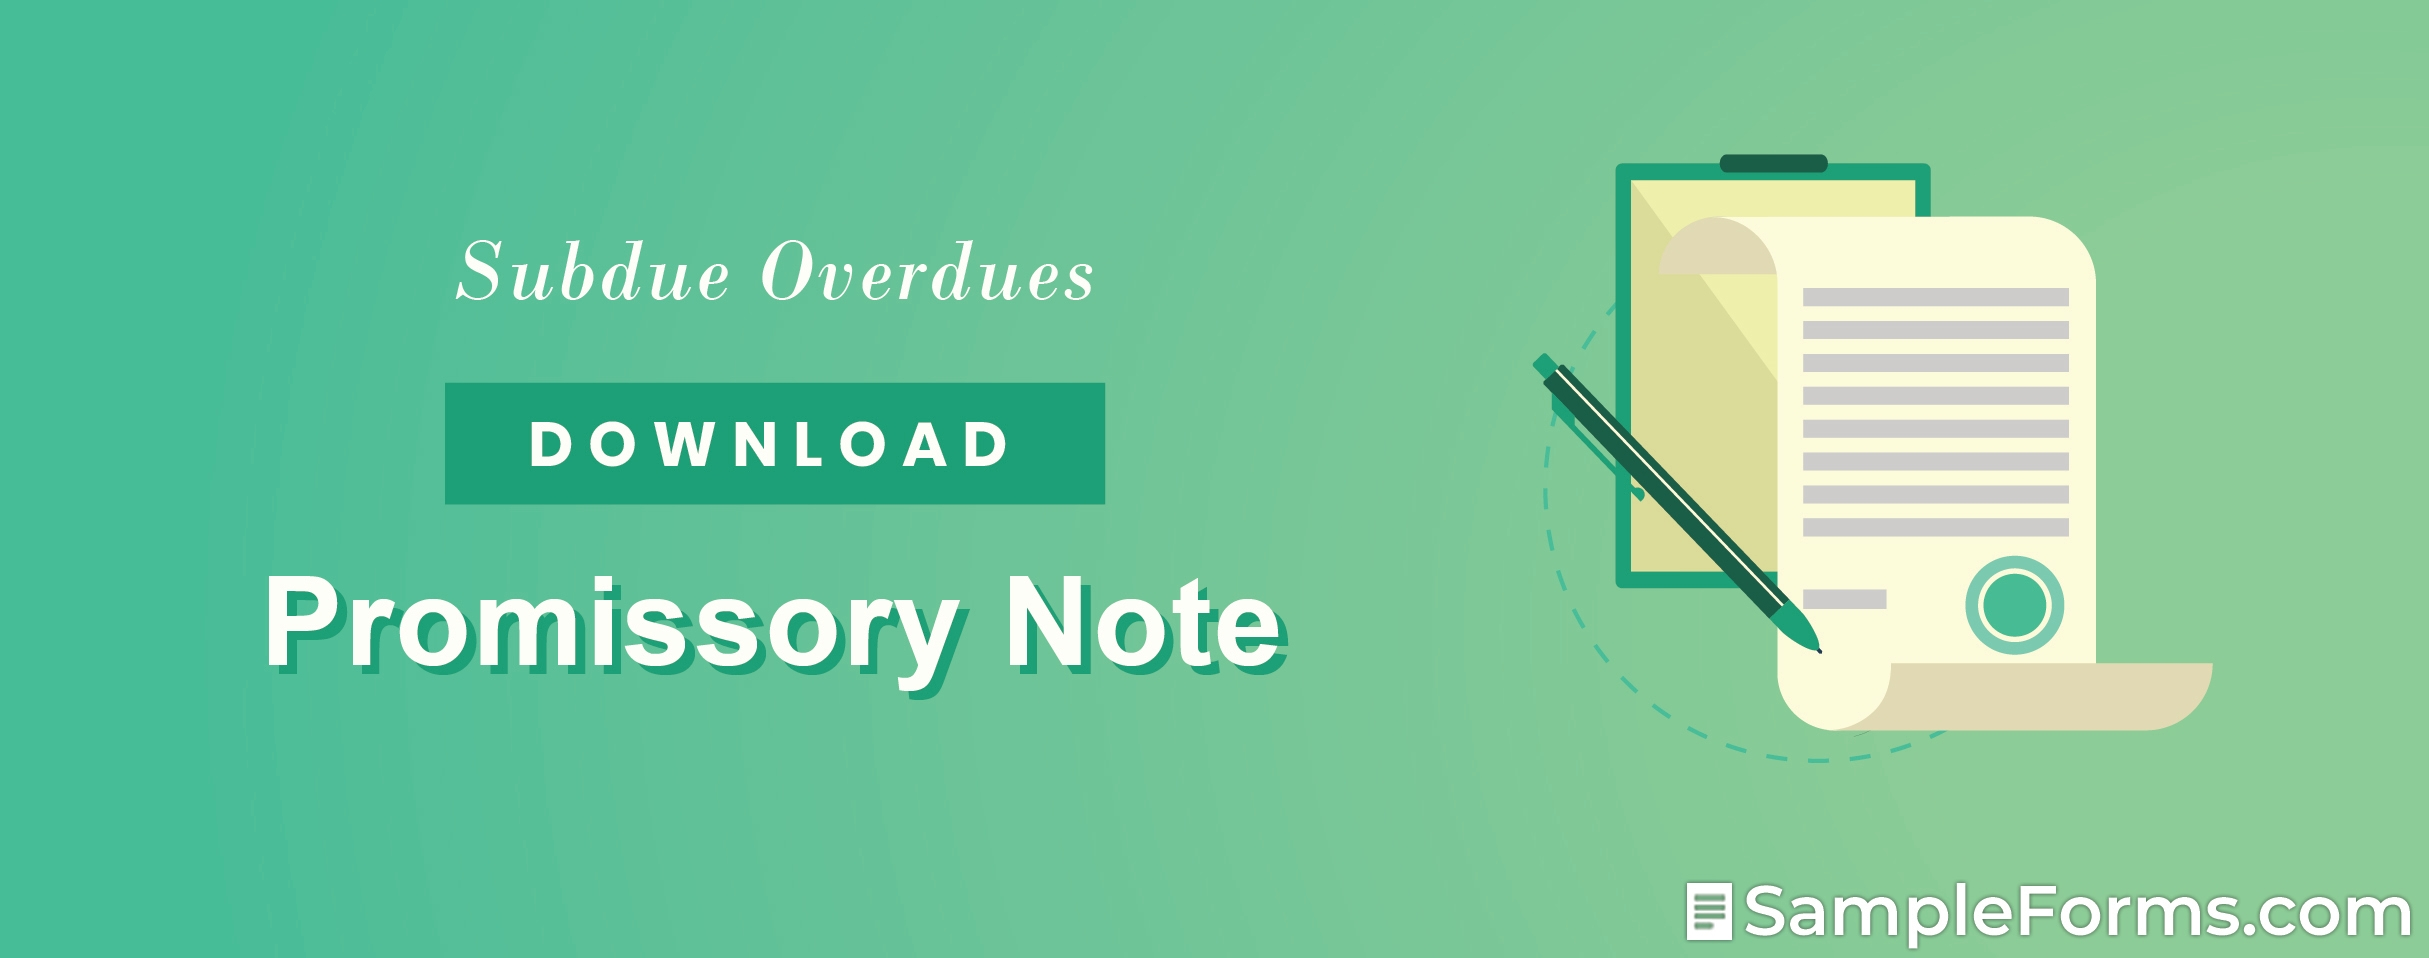 Promissory Note2